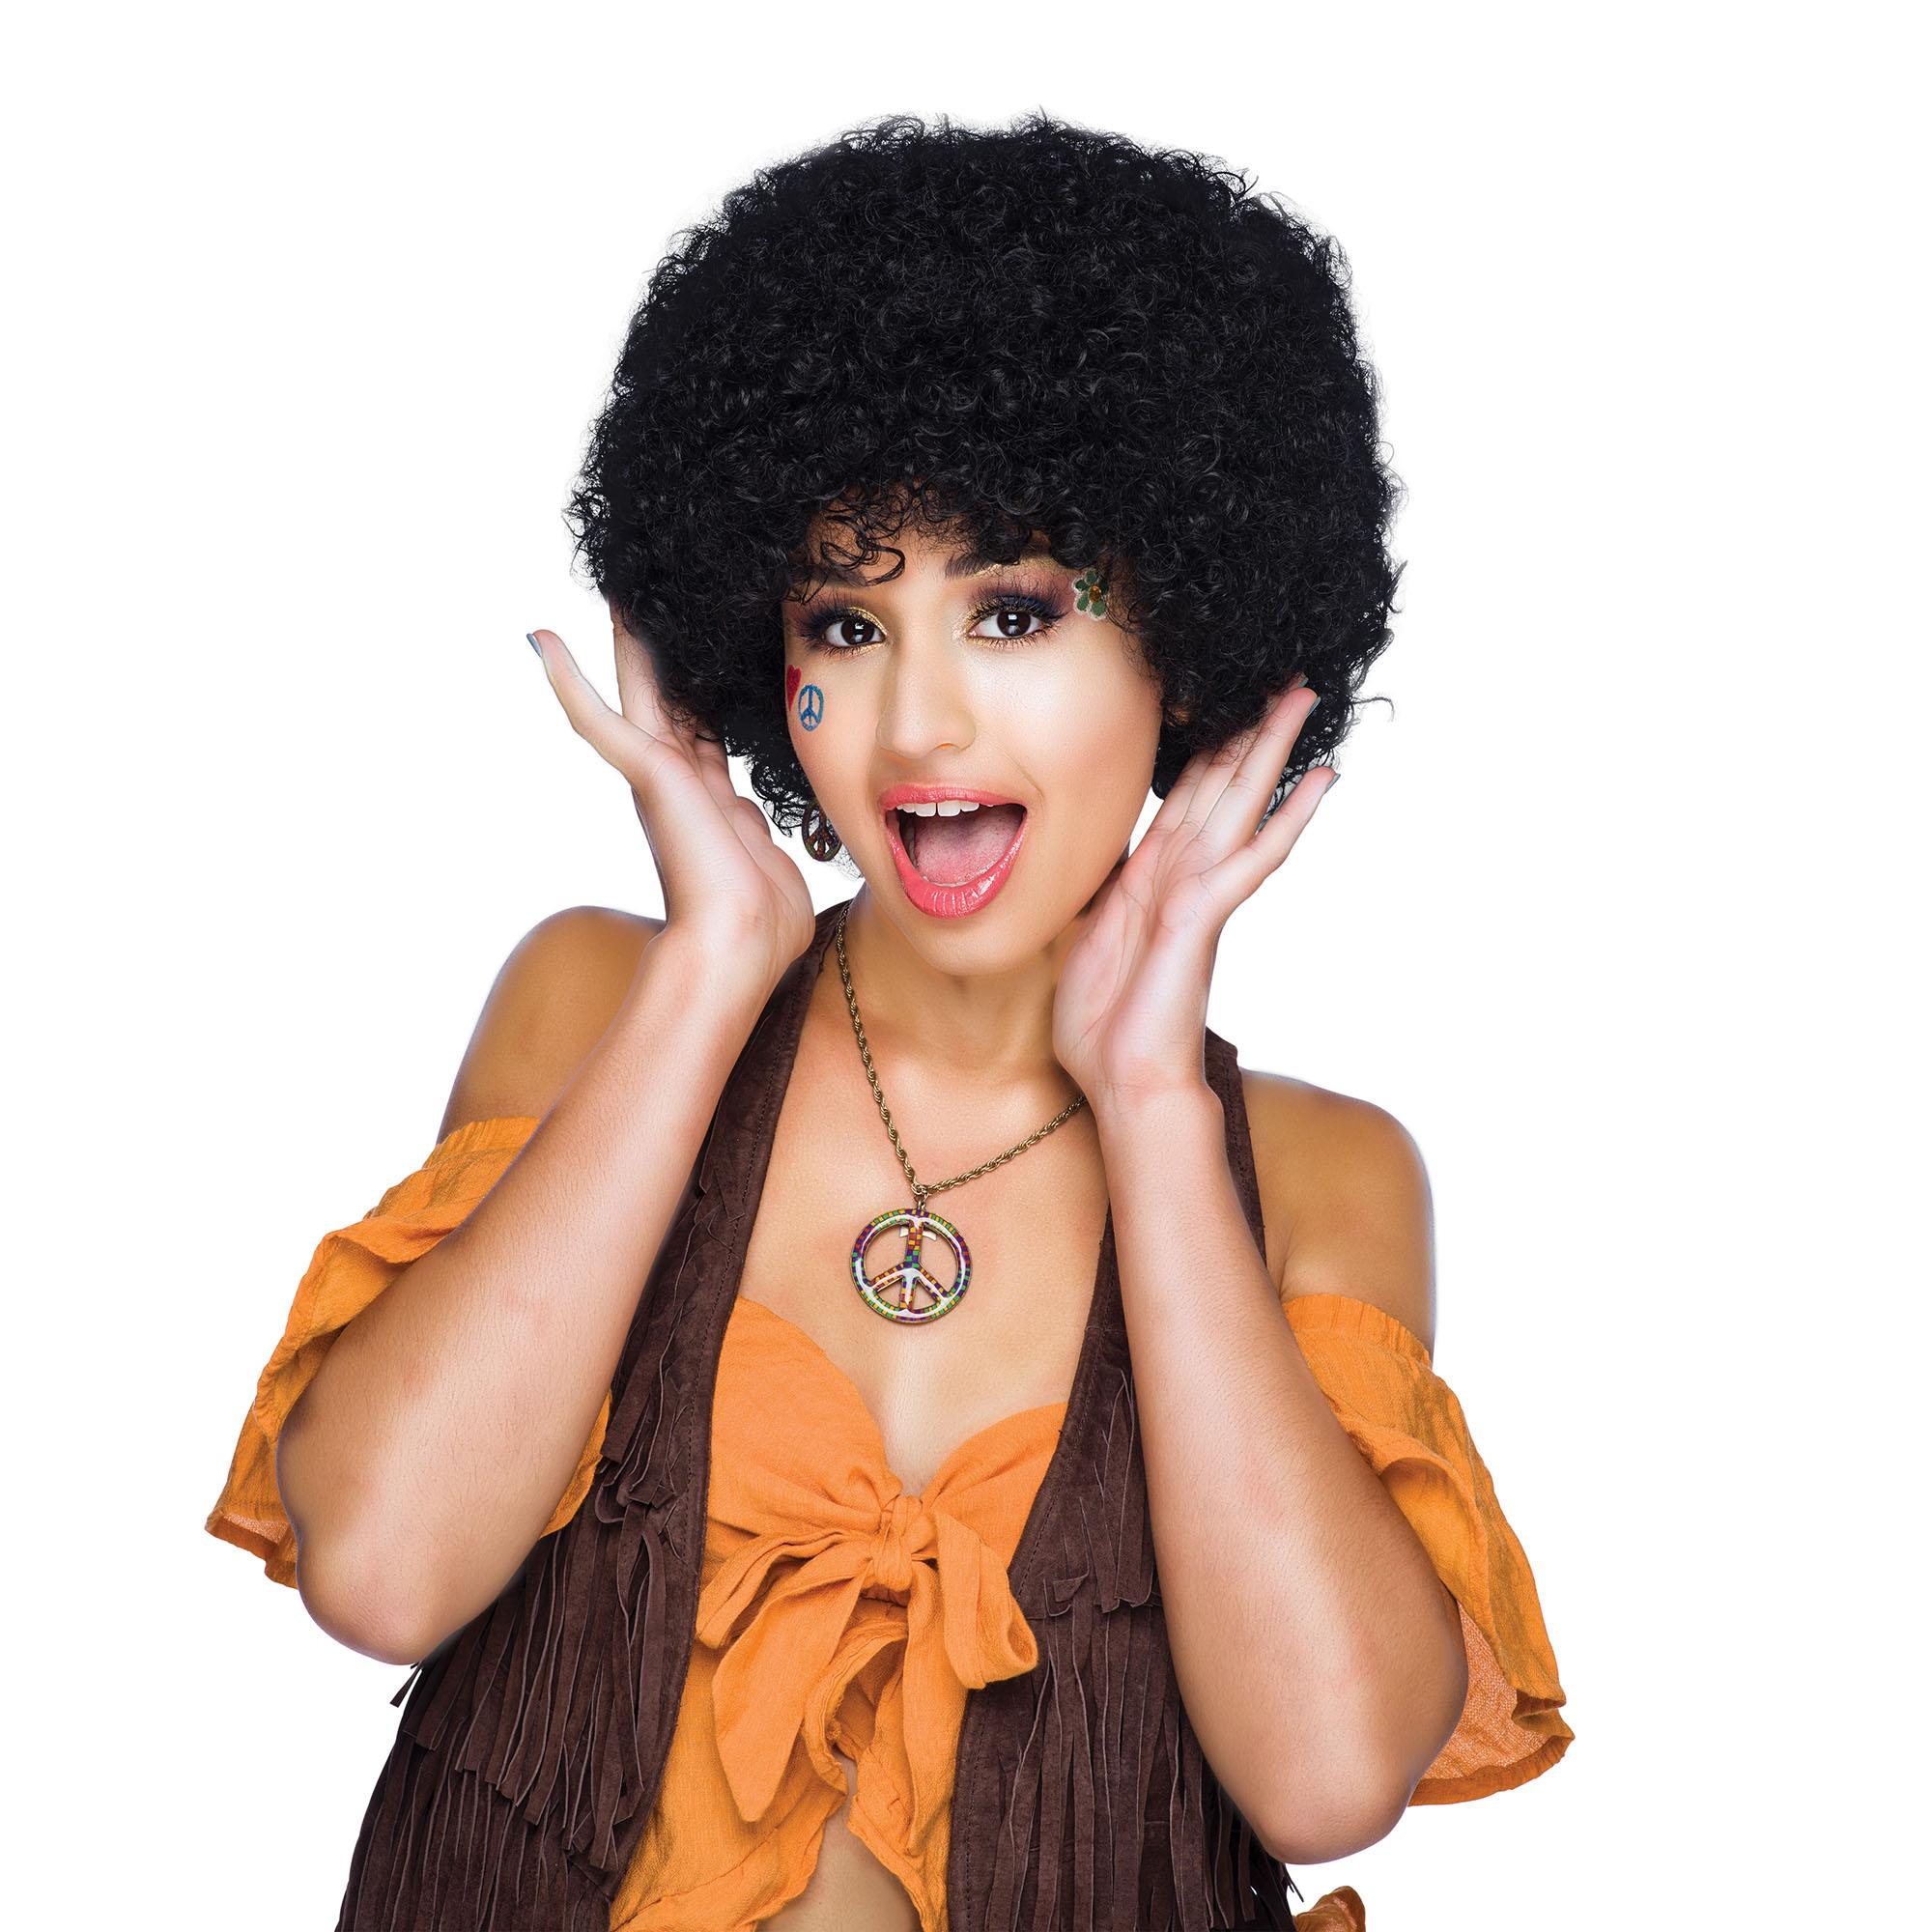 Anni/'60/'70 Unisex Uomo Donna Nero Grande Parrucca Afro Funky Da Discoteca Costume